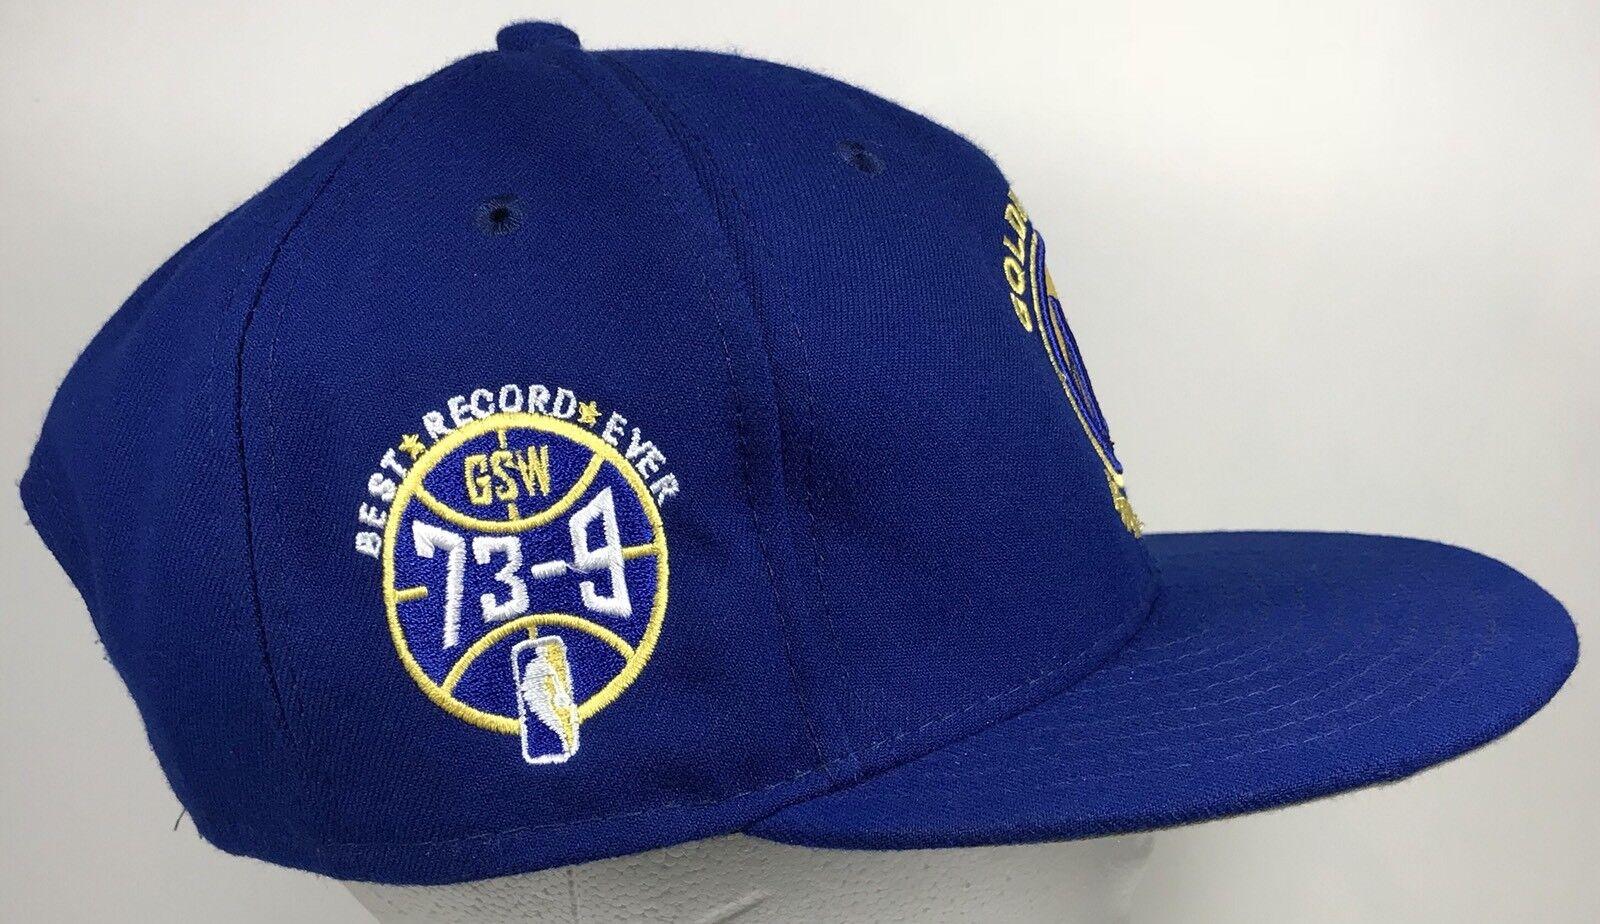 buy popular 49d78 0ff2e ... canada golden state warriors new era 9fifty royal adjustable 950 snap snapback  hat cap 950 adjustable